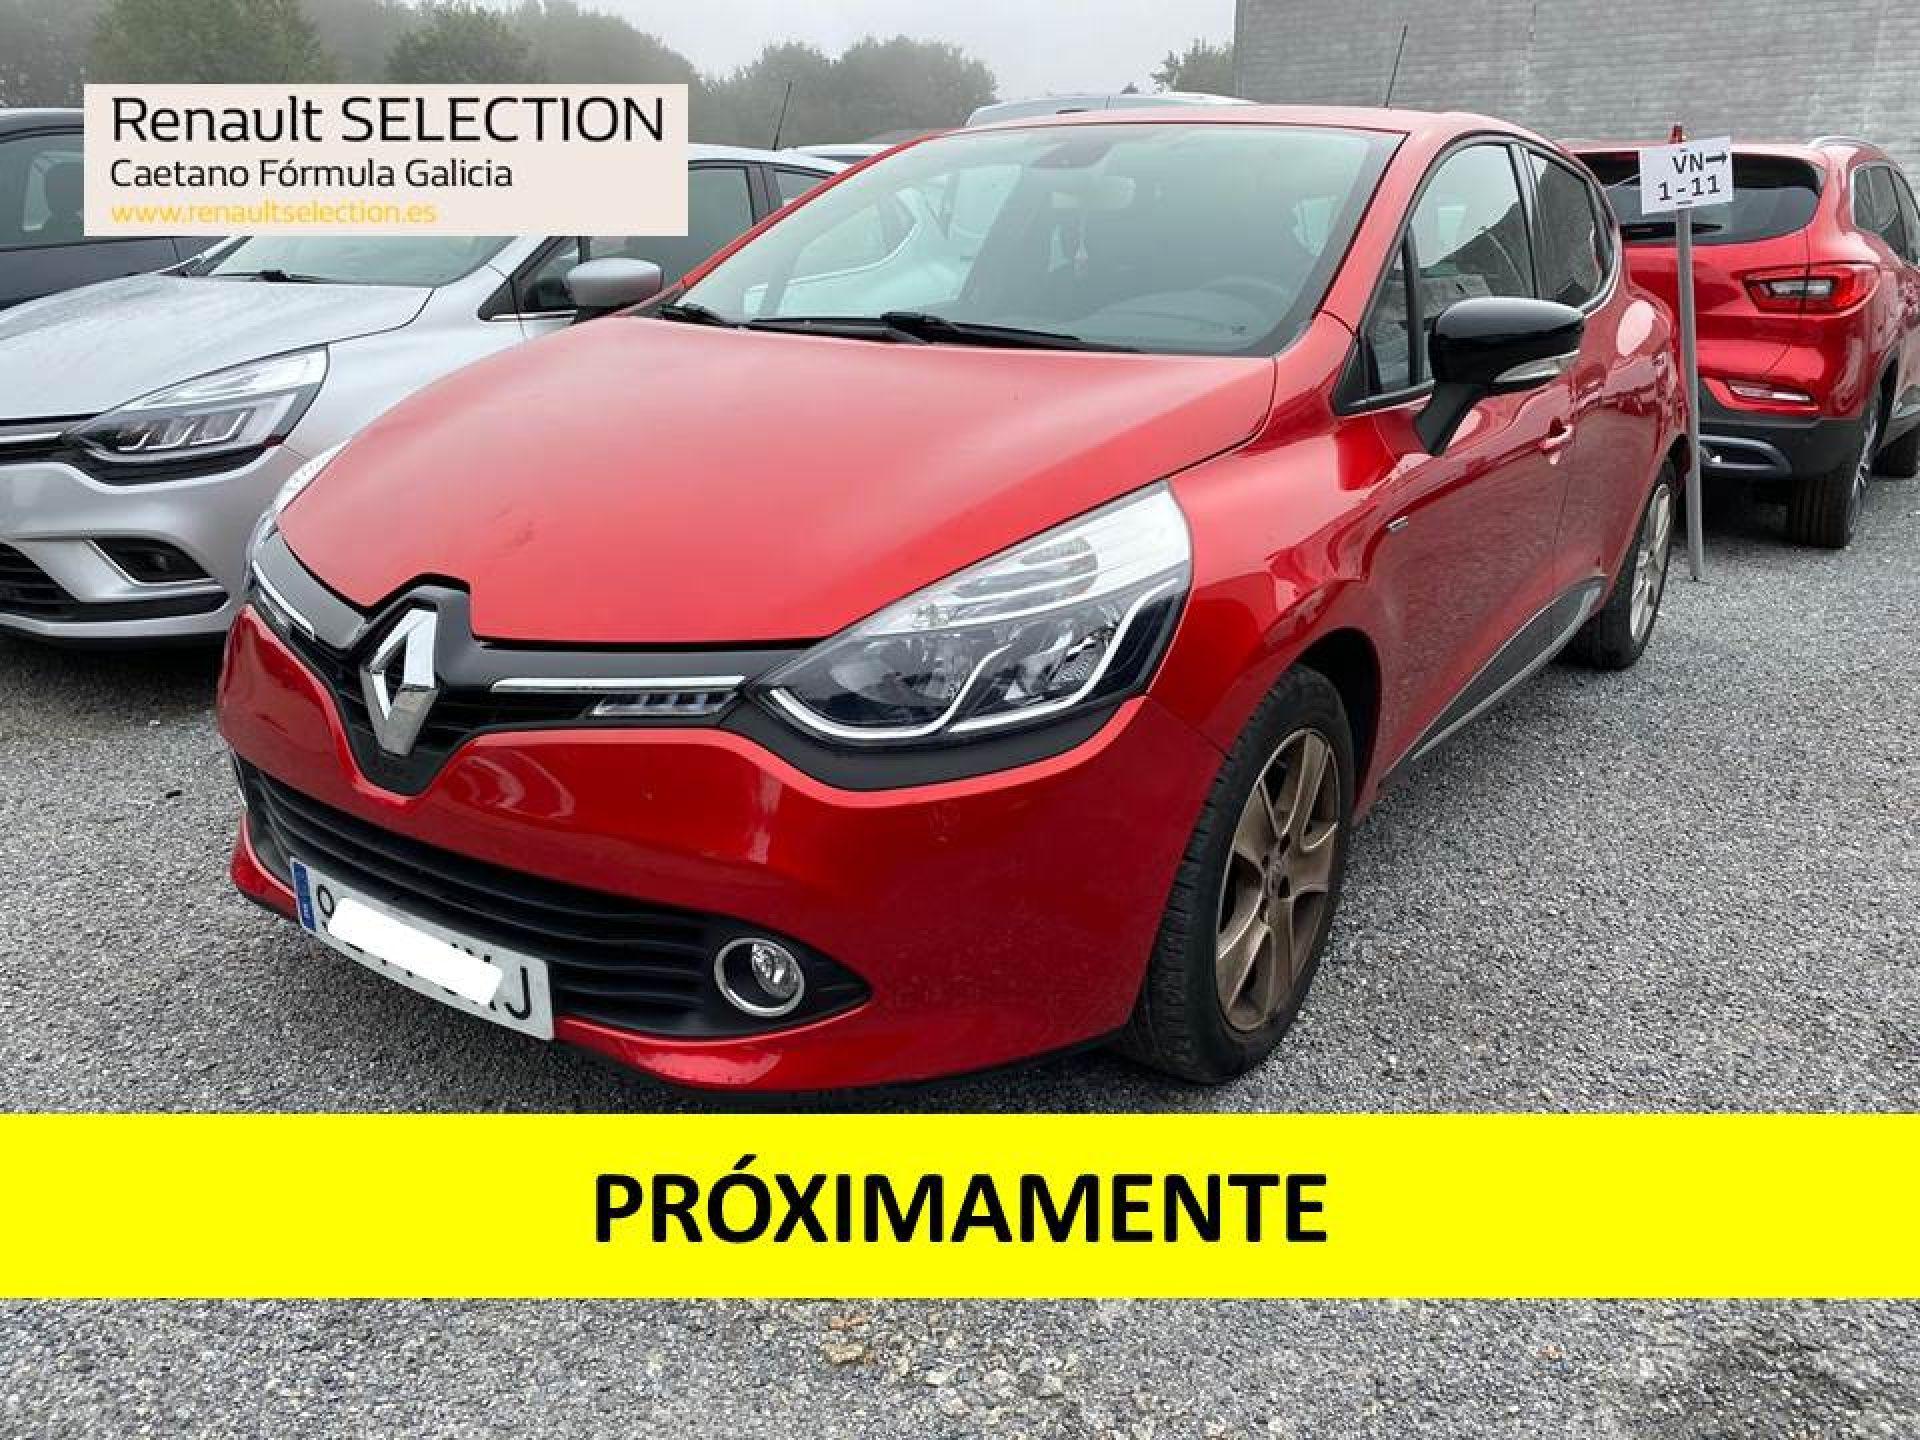 Renault Clio 4 Limited Energy TCe 66kW (90CV) segunda mano Lugo